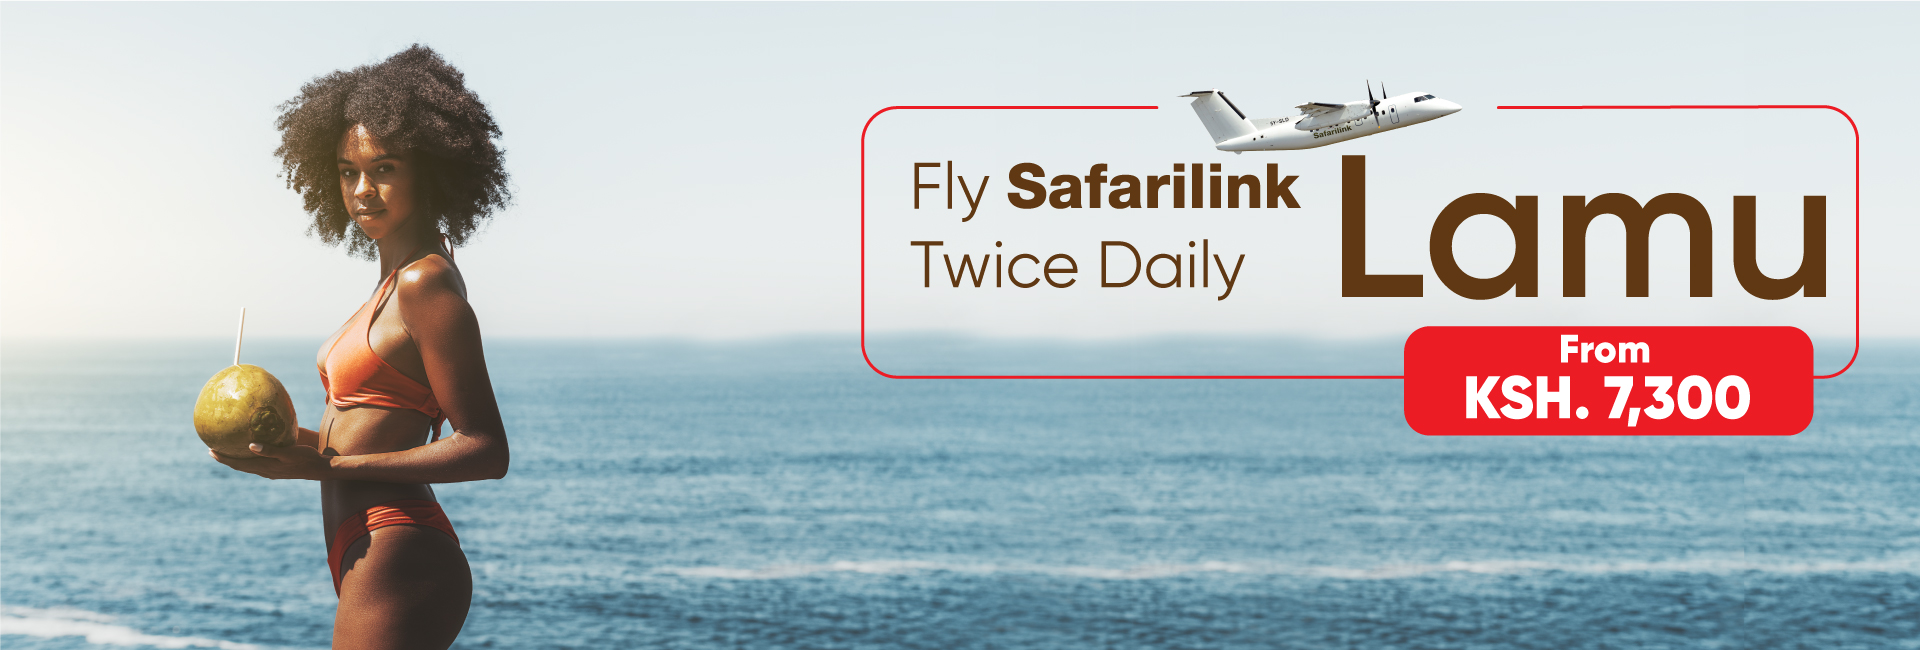 Fly Safarilink To Lamu Island' Kenya